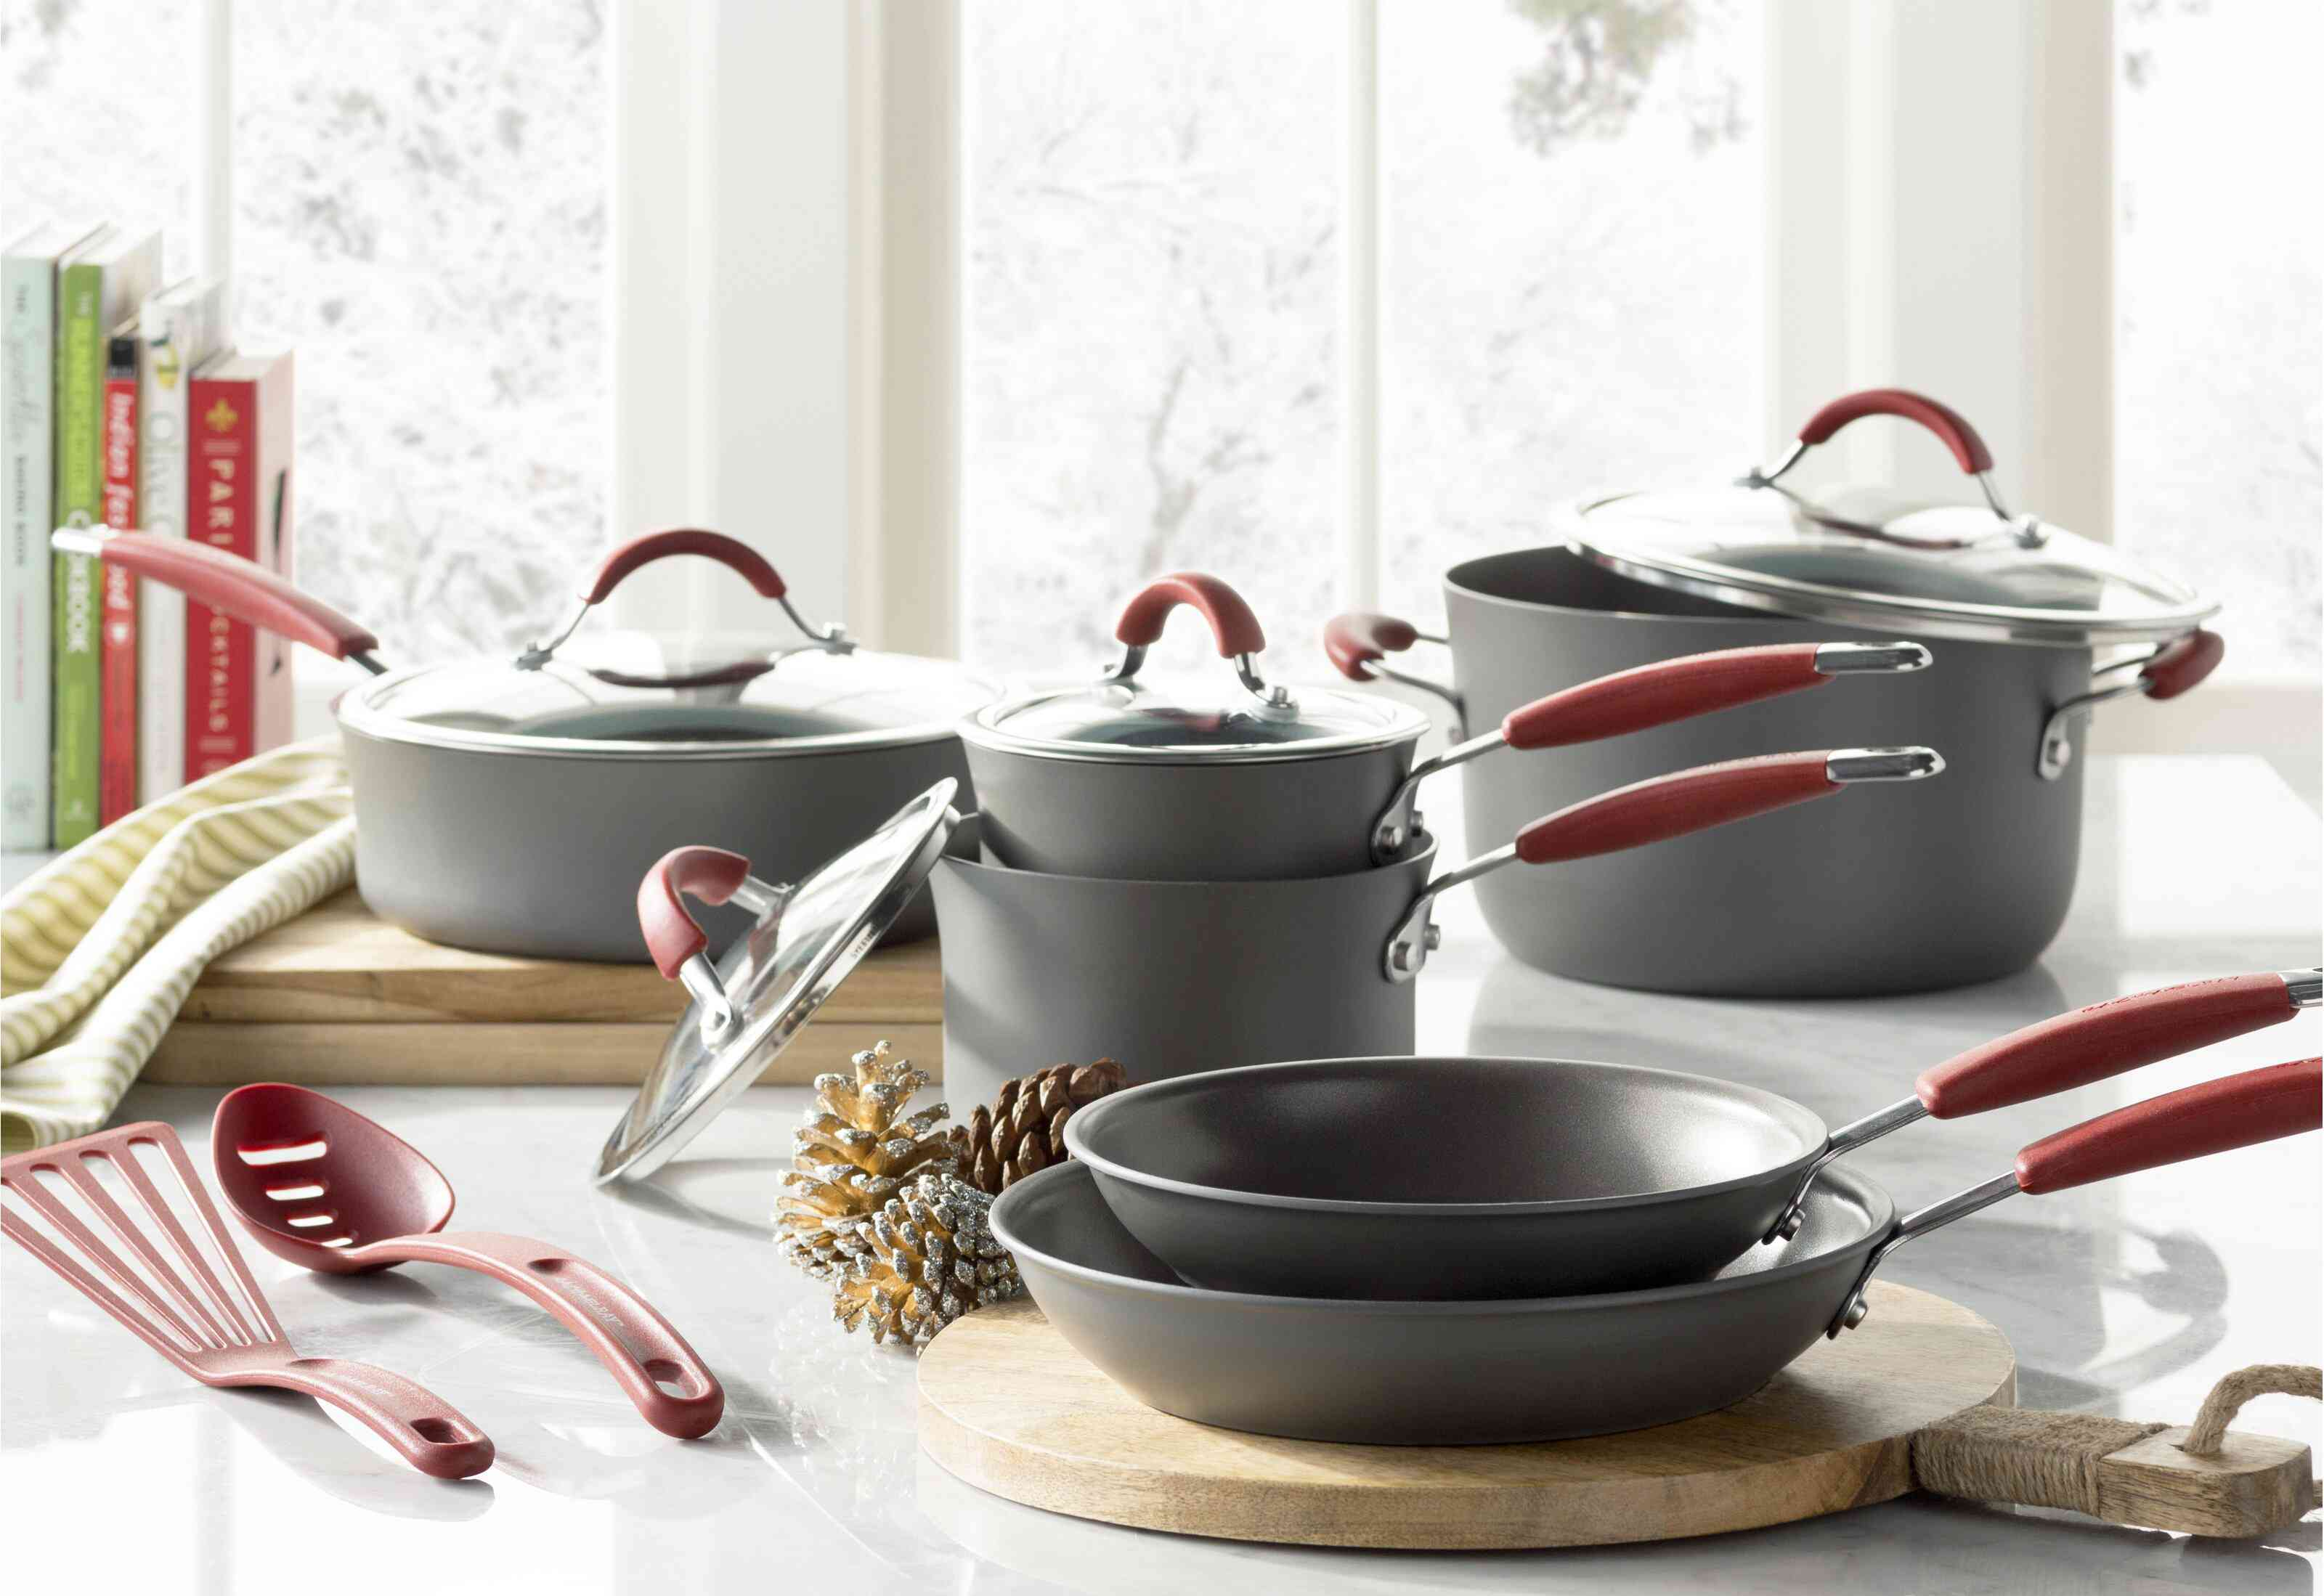 Rachael Ray Hard Anodized Nonstick Cookware Set